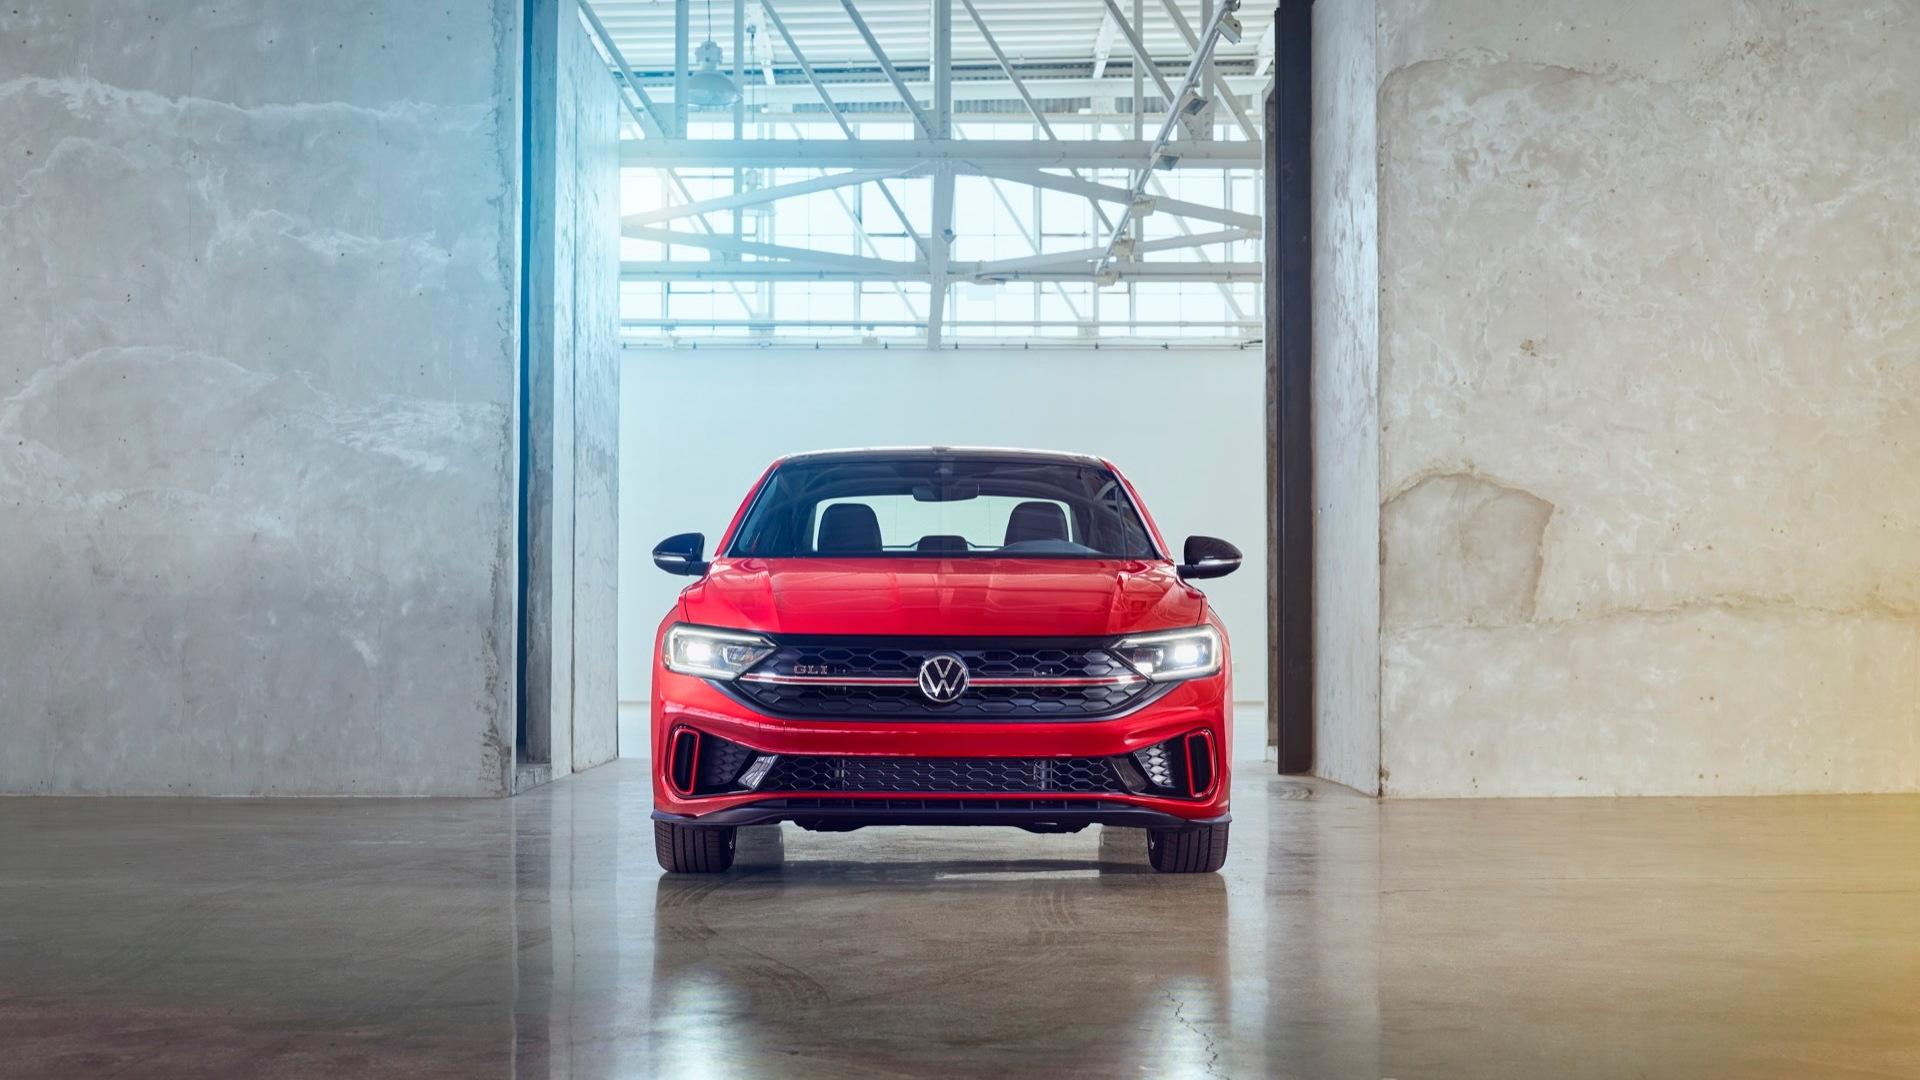 2022 Volkswagen Jetta GLI